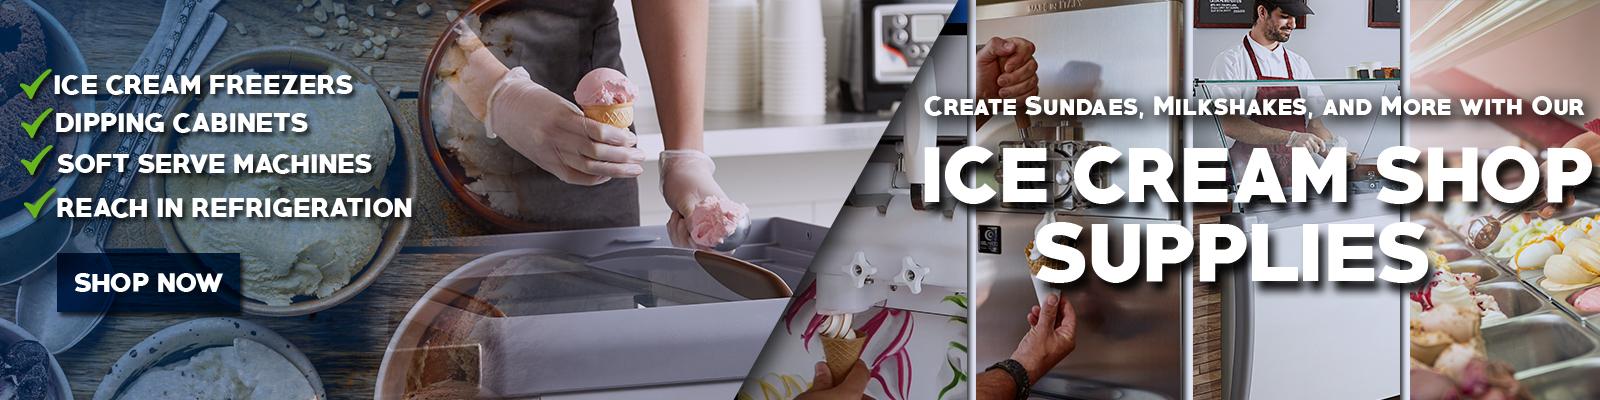 Commercial Ice Cream Shop Supplies, Ice Cream Shop Equipment